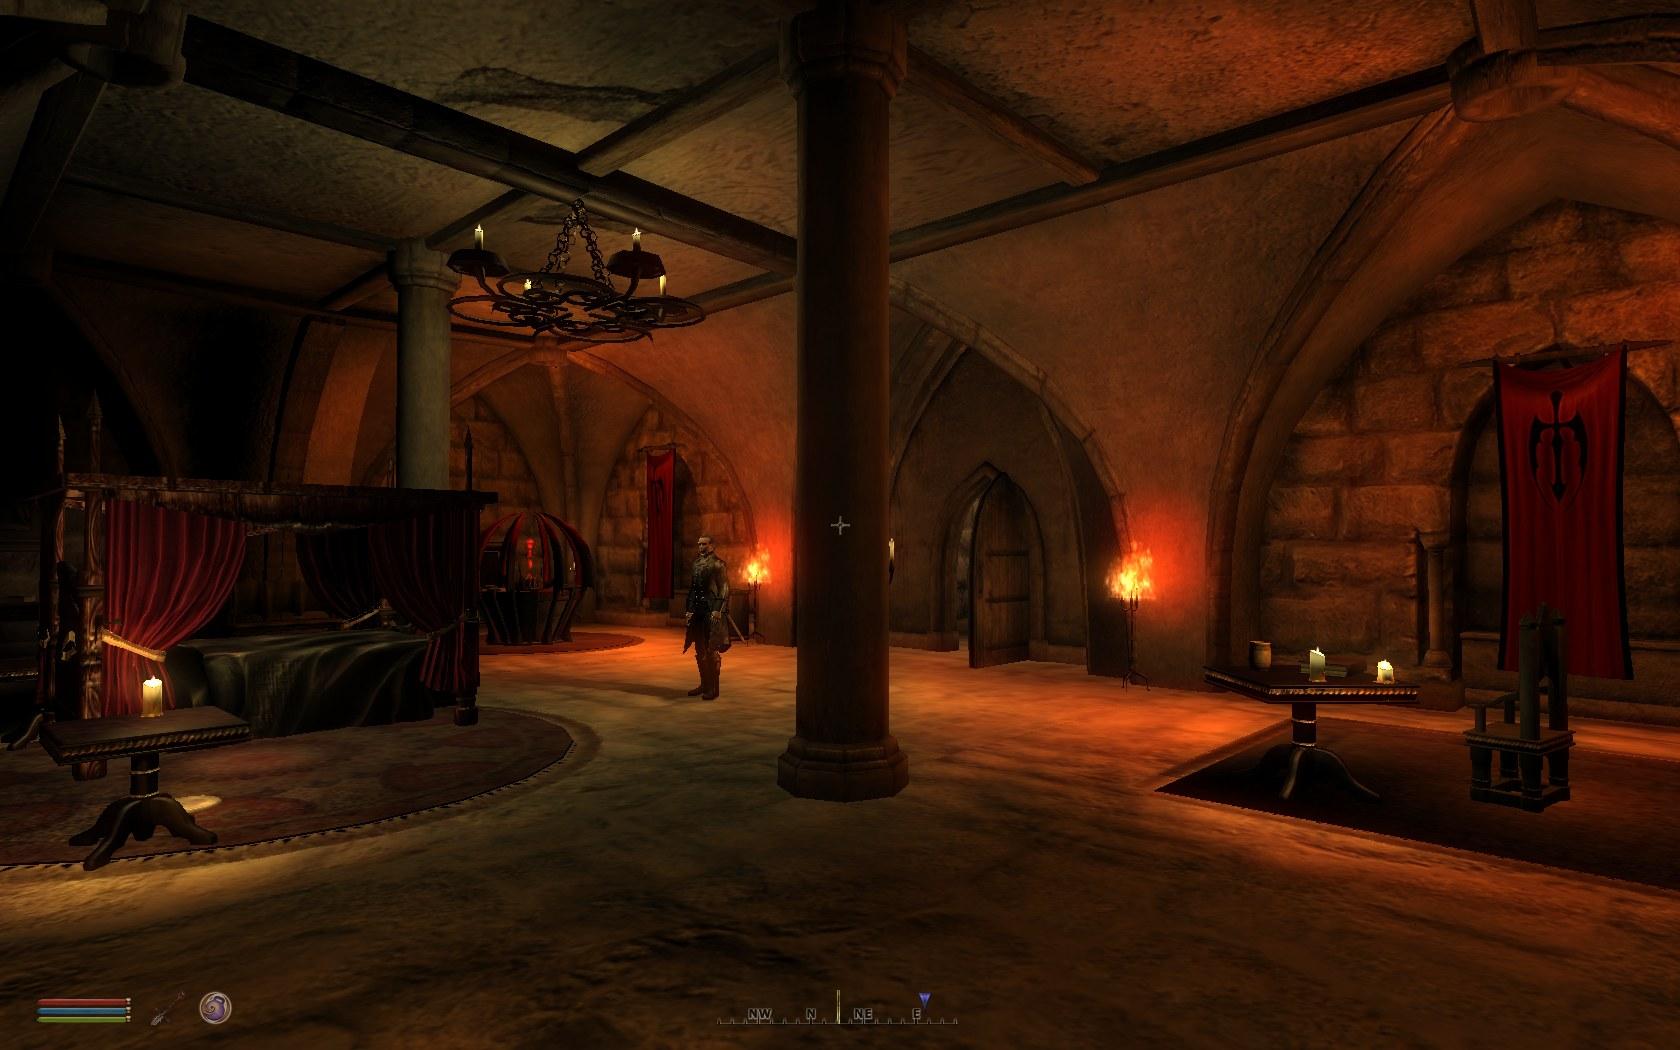 Oblivion Wallpaper Hd Unholy Darkness Image Mod Db